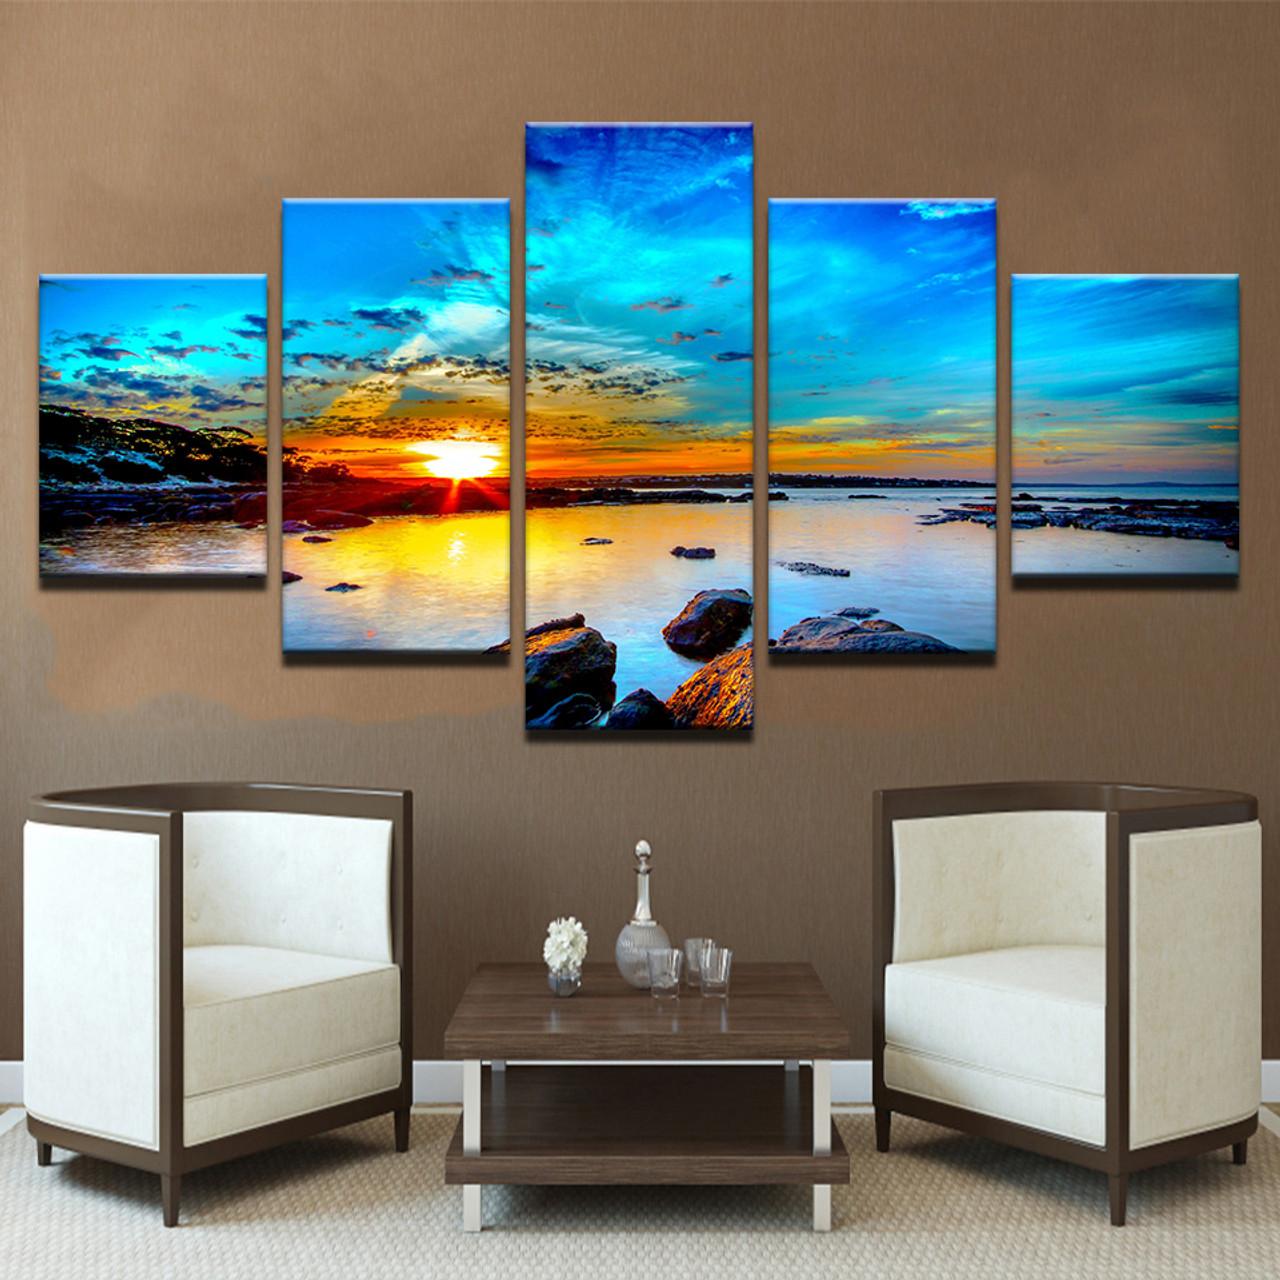 Blue Beach Seascapes Paintings  5 Piece Canvas Wall Art Print Home Decor